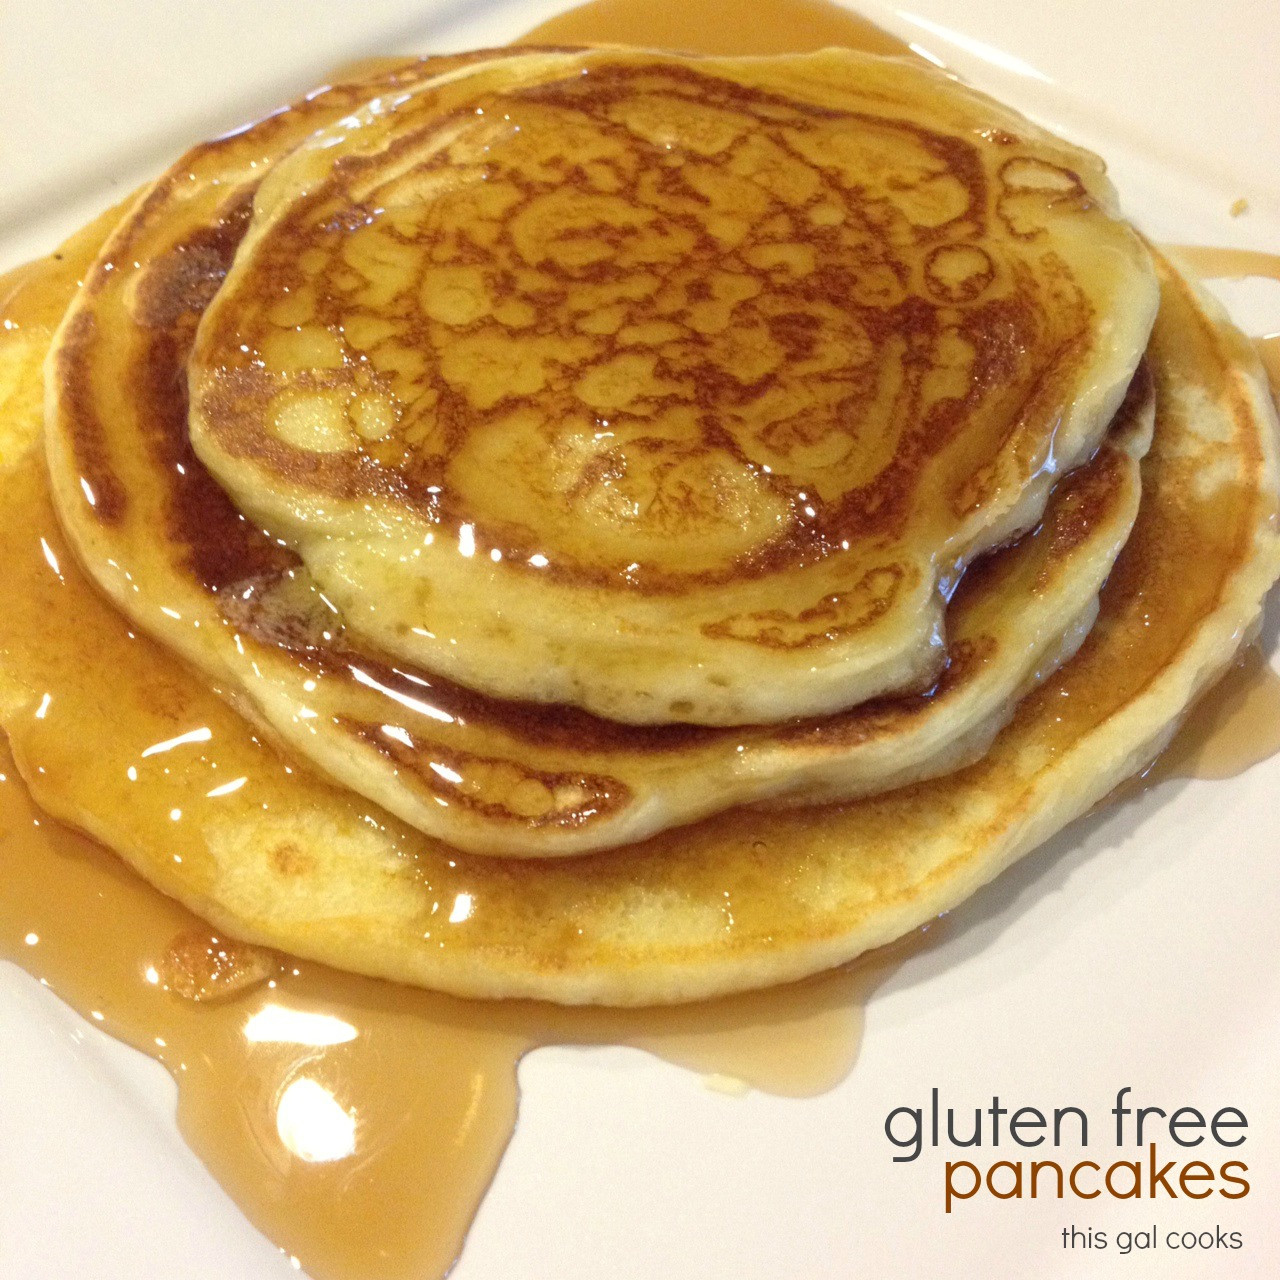 Gluten Free Pancakes  Gluten Free Pancakes Recipe — Dishmaps